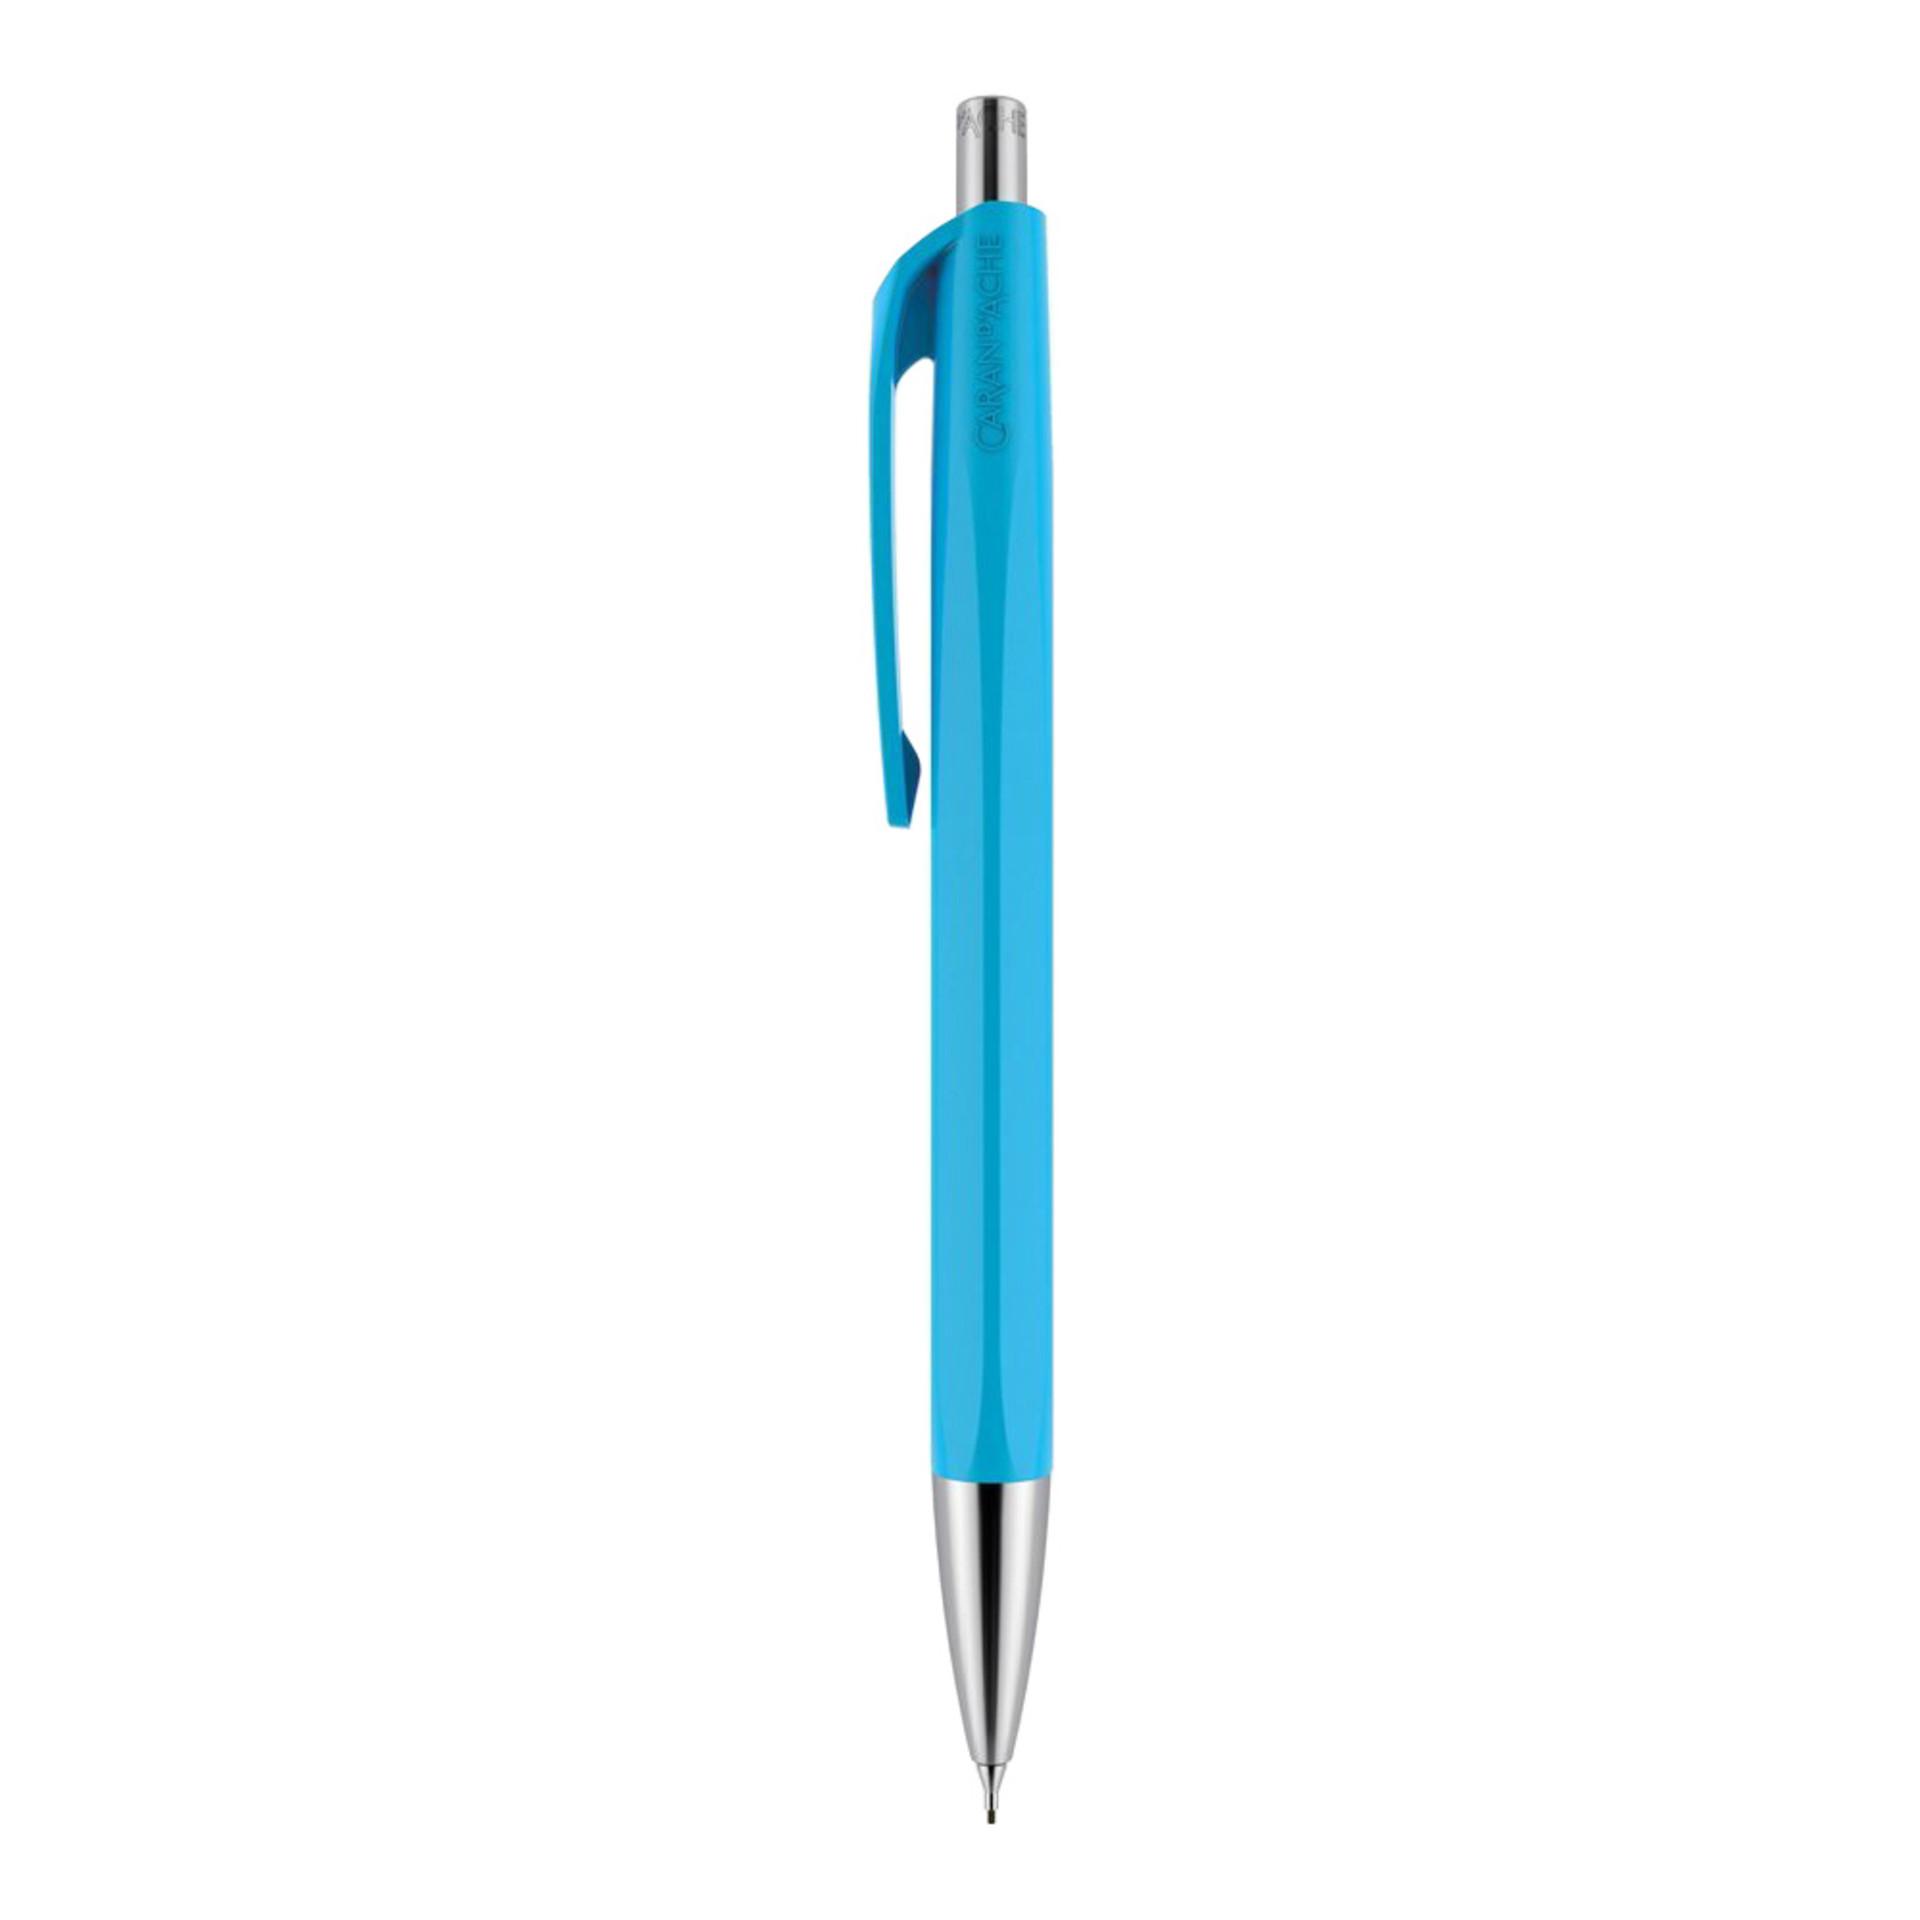 Caran d'Ache 888 .7mm Infinite Mechanical Pencil Turquoise